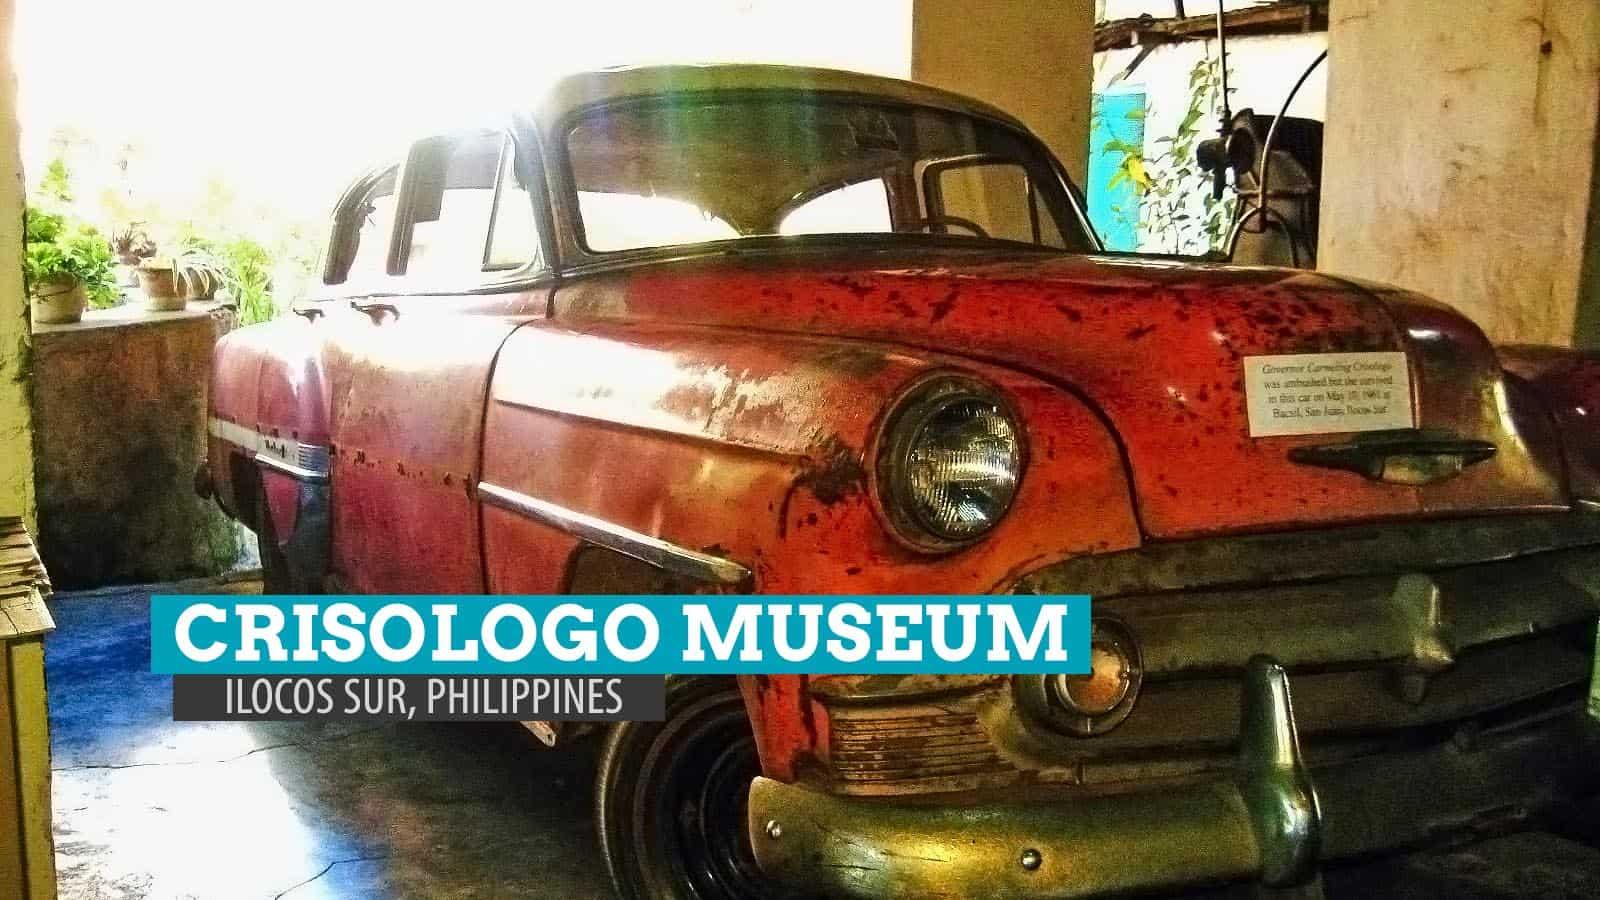 Crisologo博物馆。南伊罗戈省维甘市的一些历史,一些政治 | 穷游者的行程博客